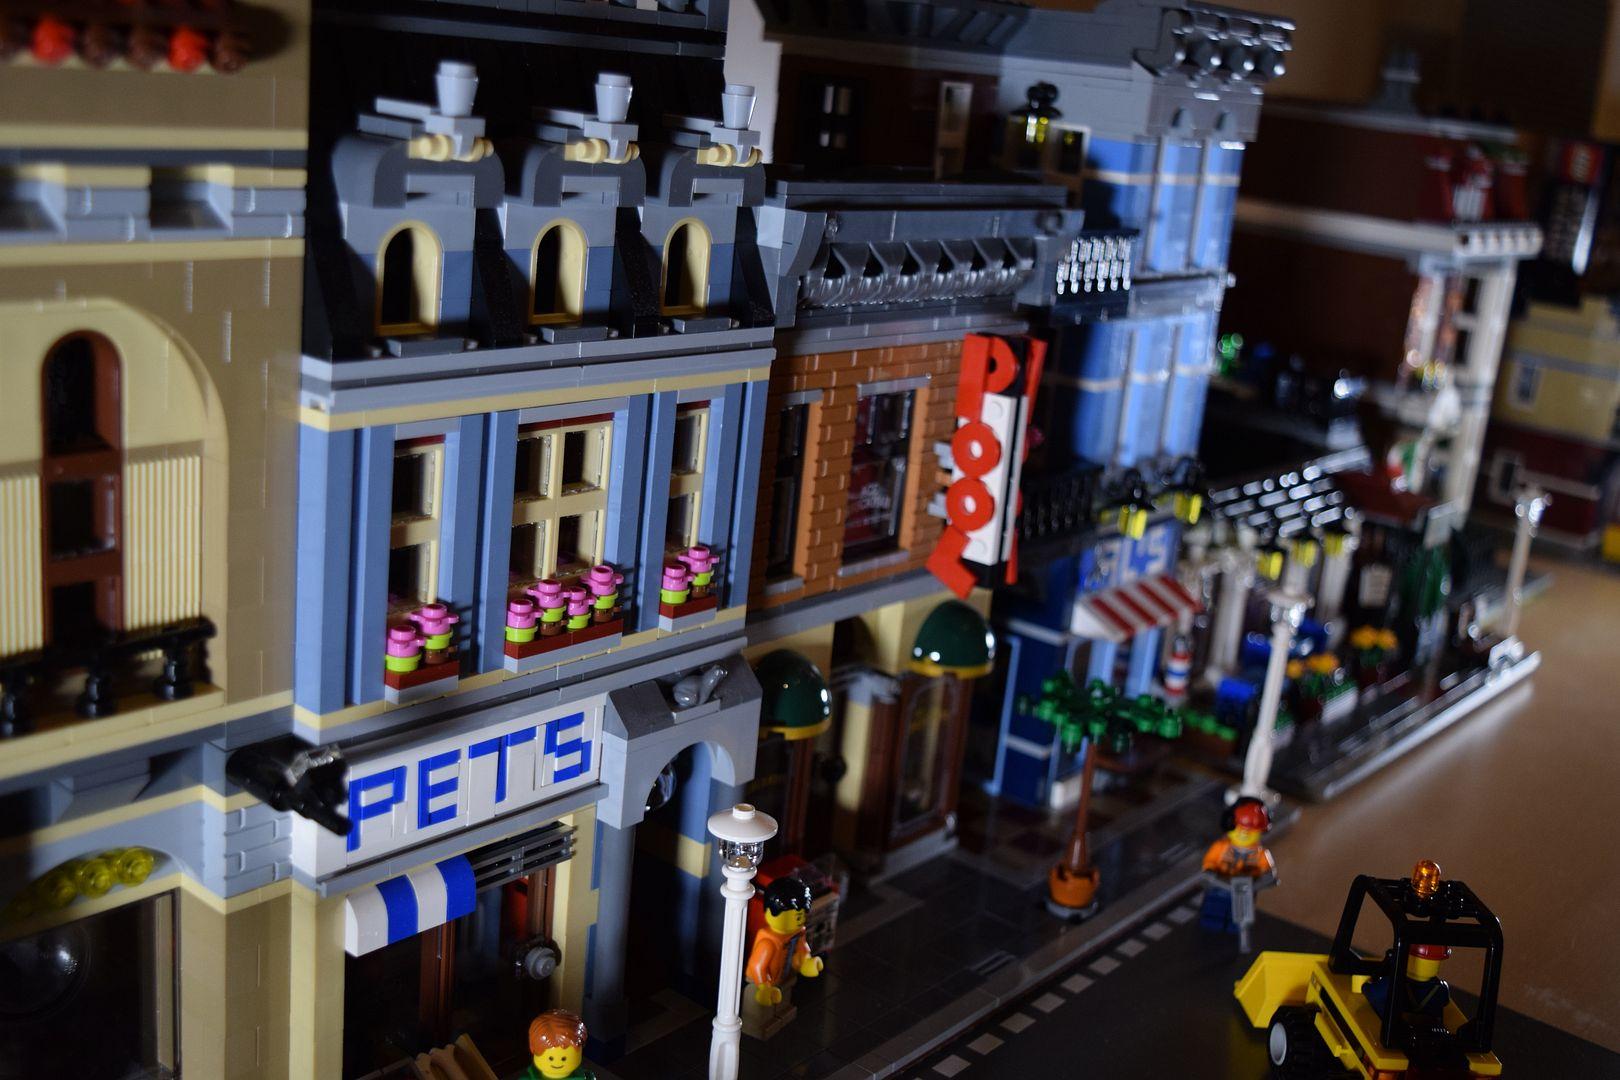 Lego is the new AM DSC_0426_zps67ctnxty